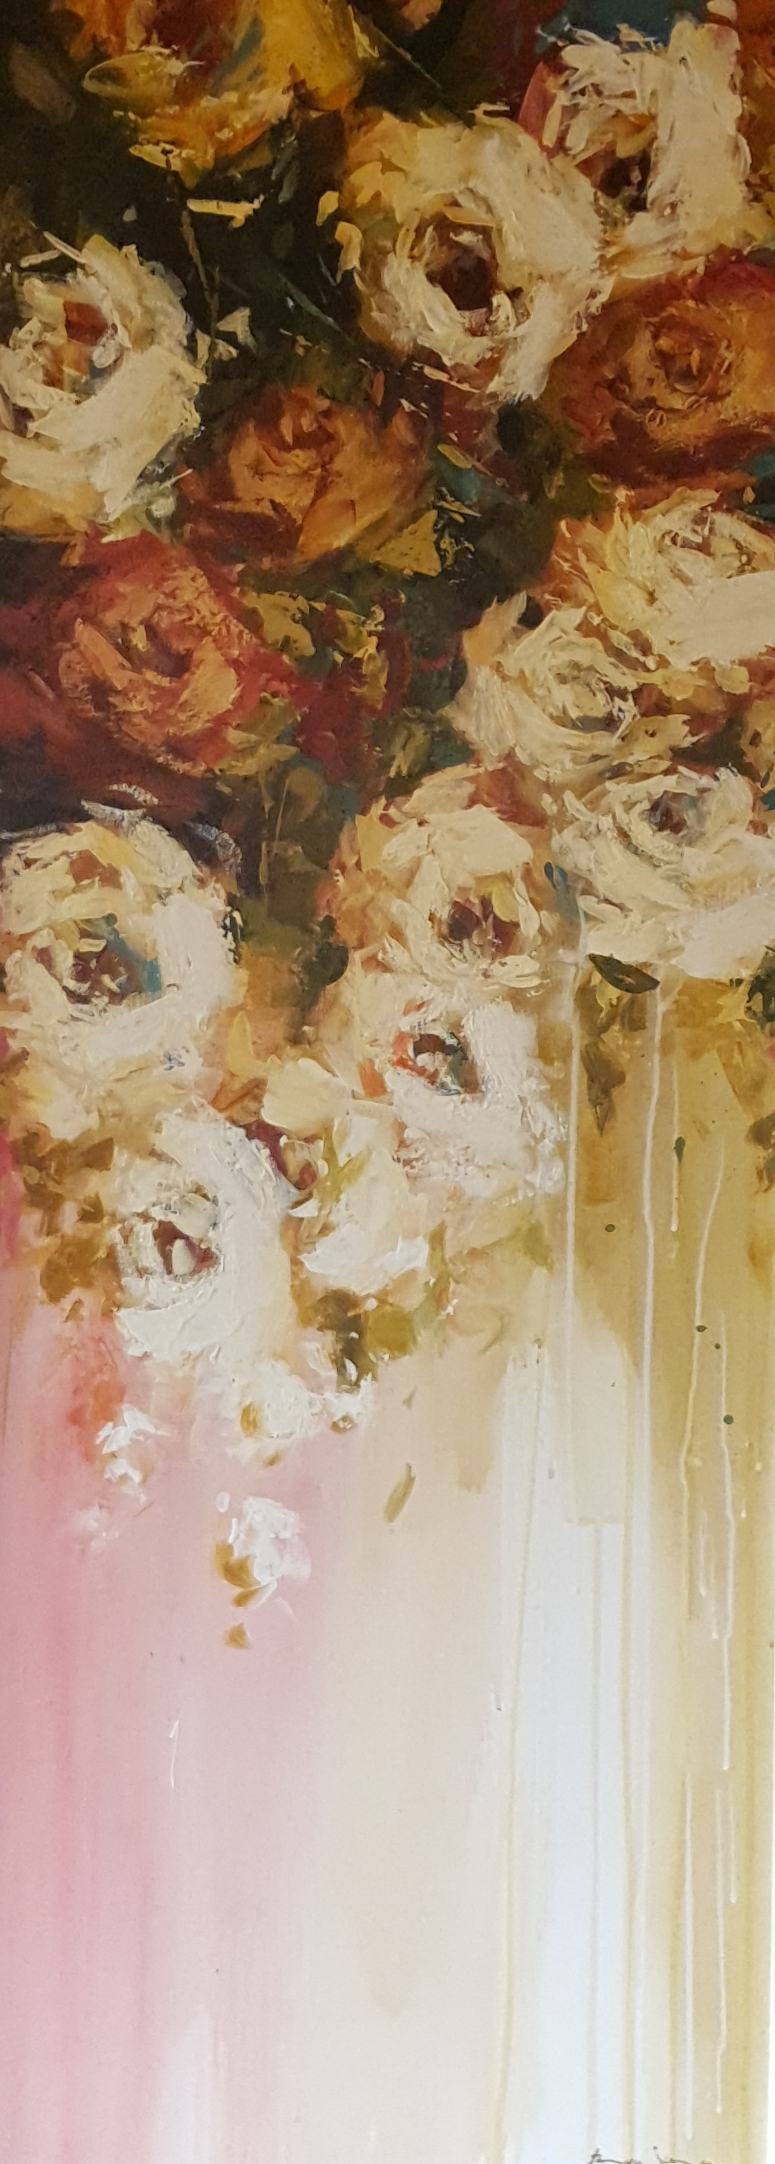 tanya flowers 6671